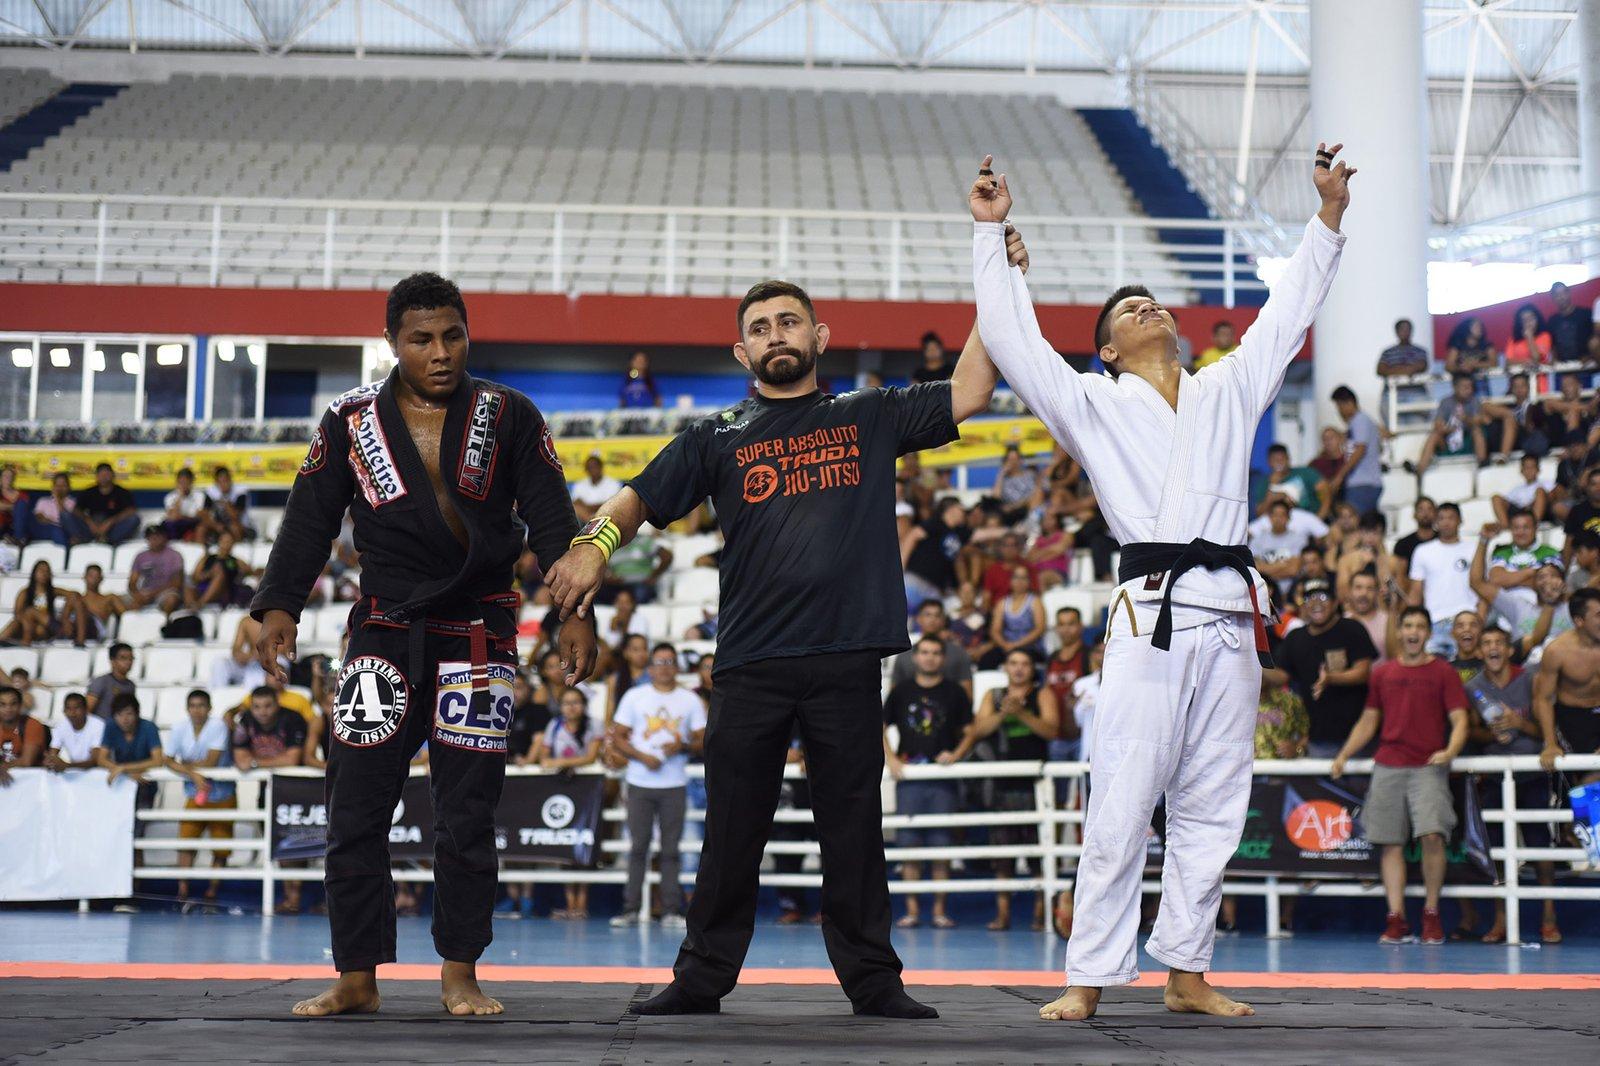 1º Super Absoluto de Jiu-jítsu reúne 500 atletas no ginásio poliesportivo do Amazonas